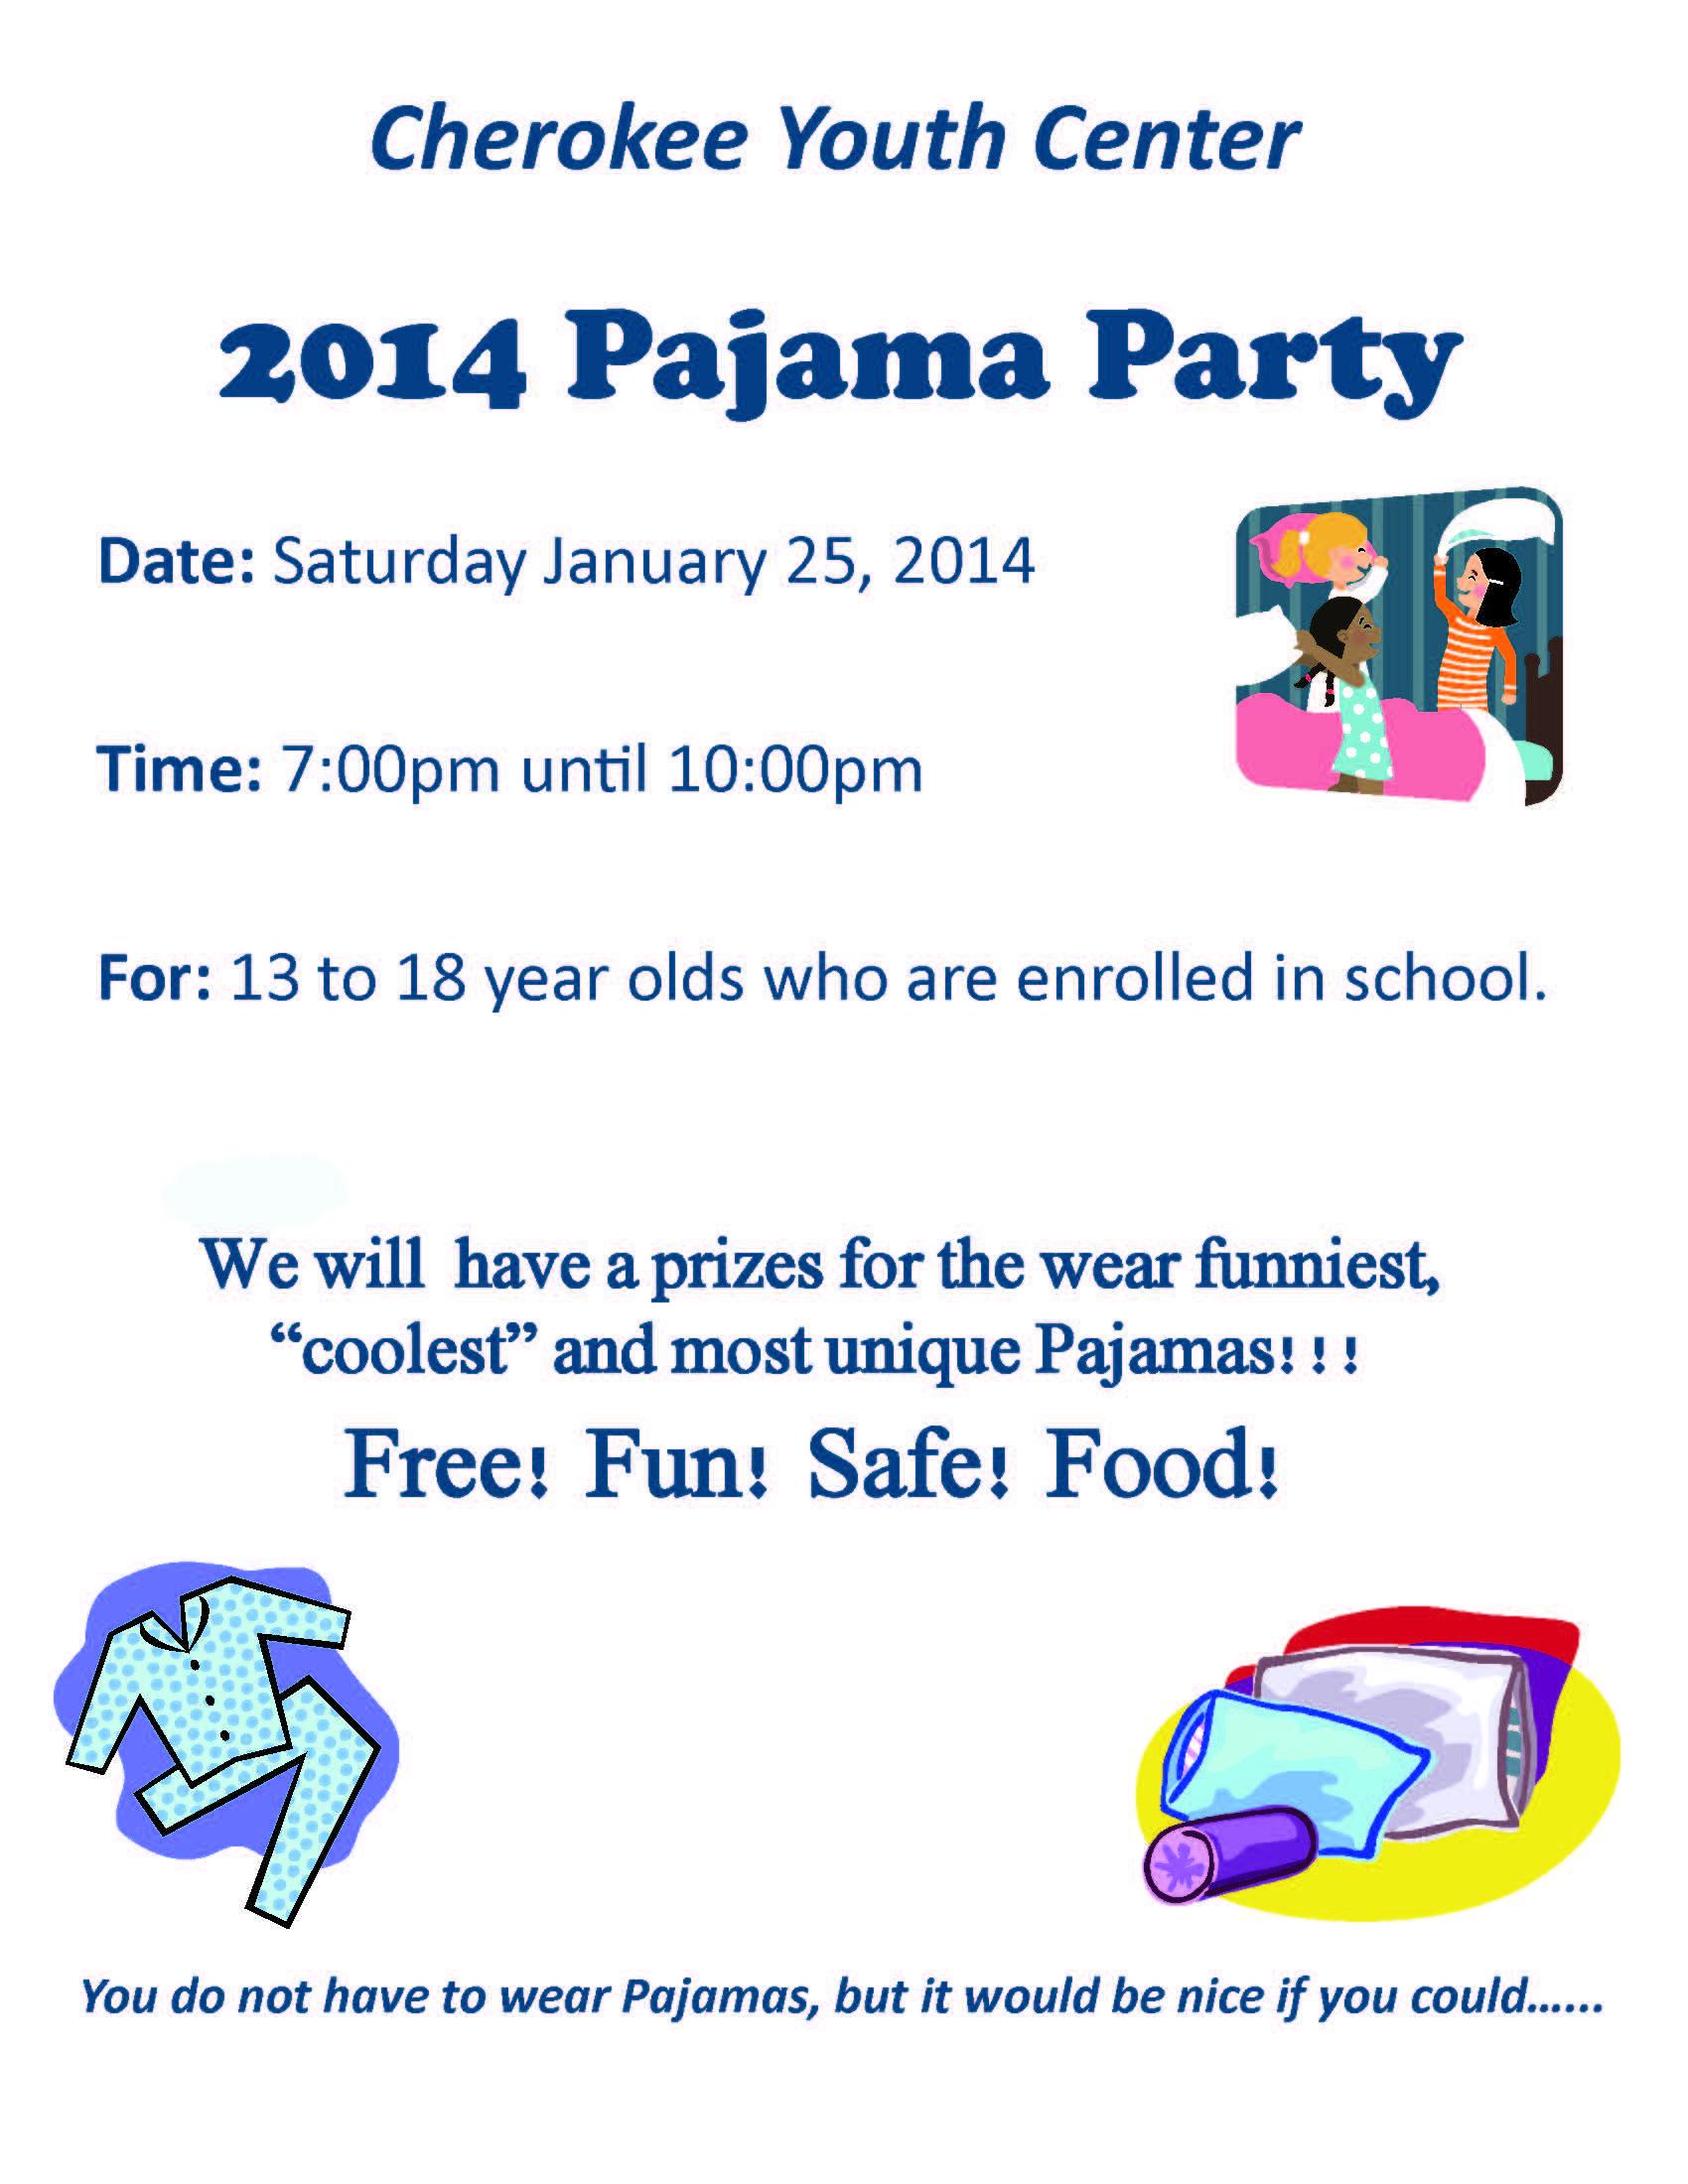 2014 Pajama Party Flyer